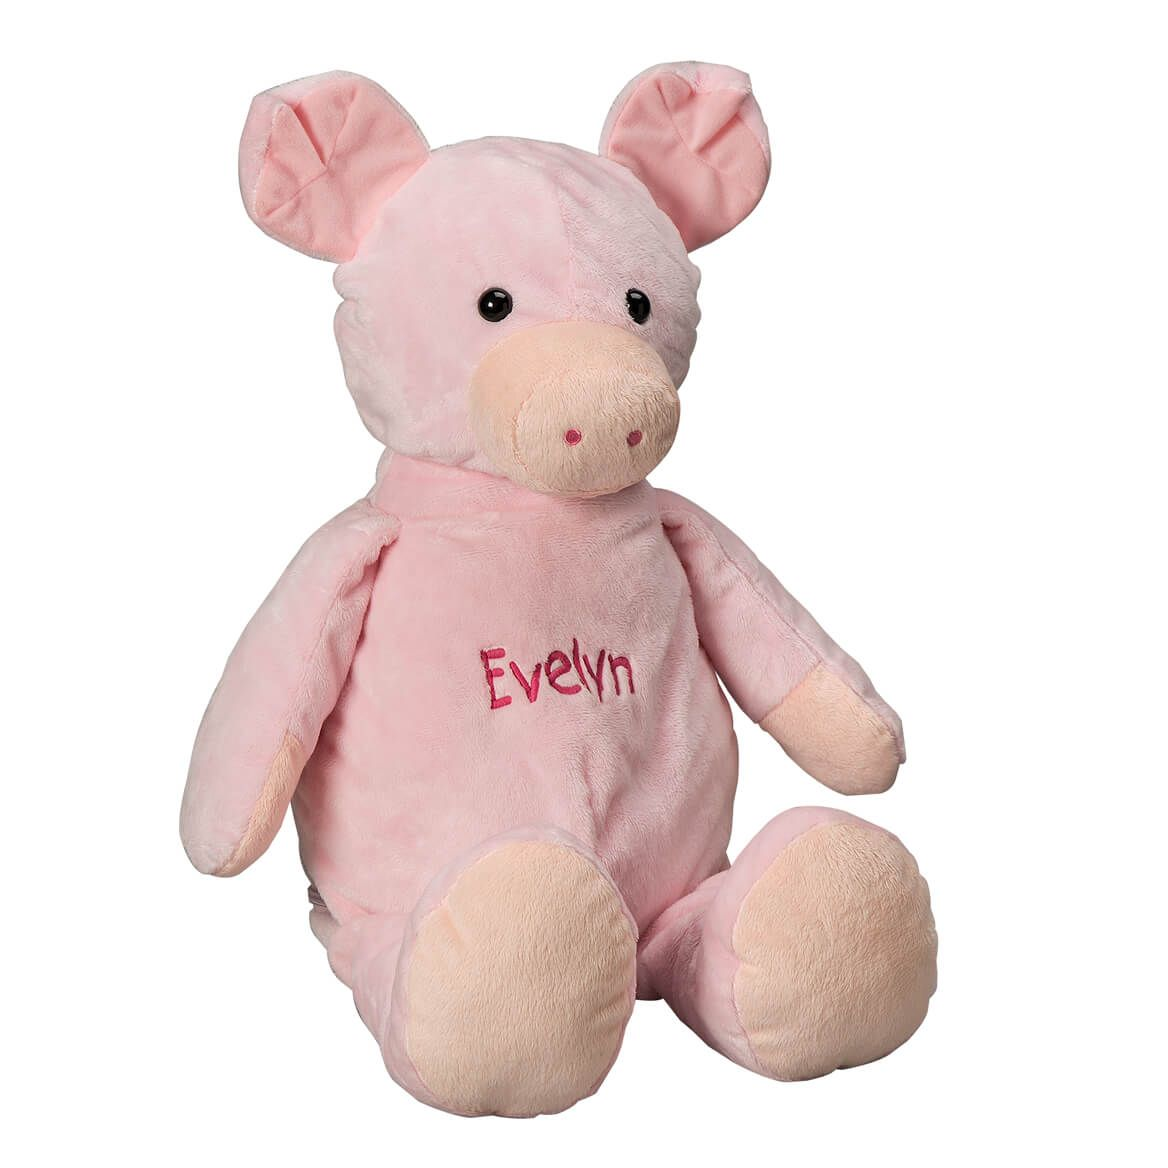 Personalized Stuffed Pig-360673